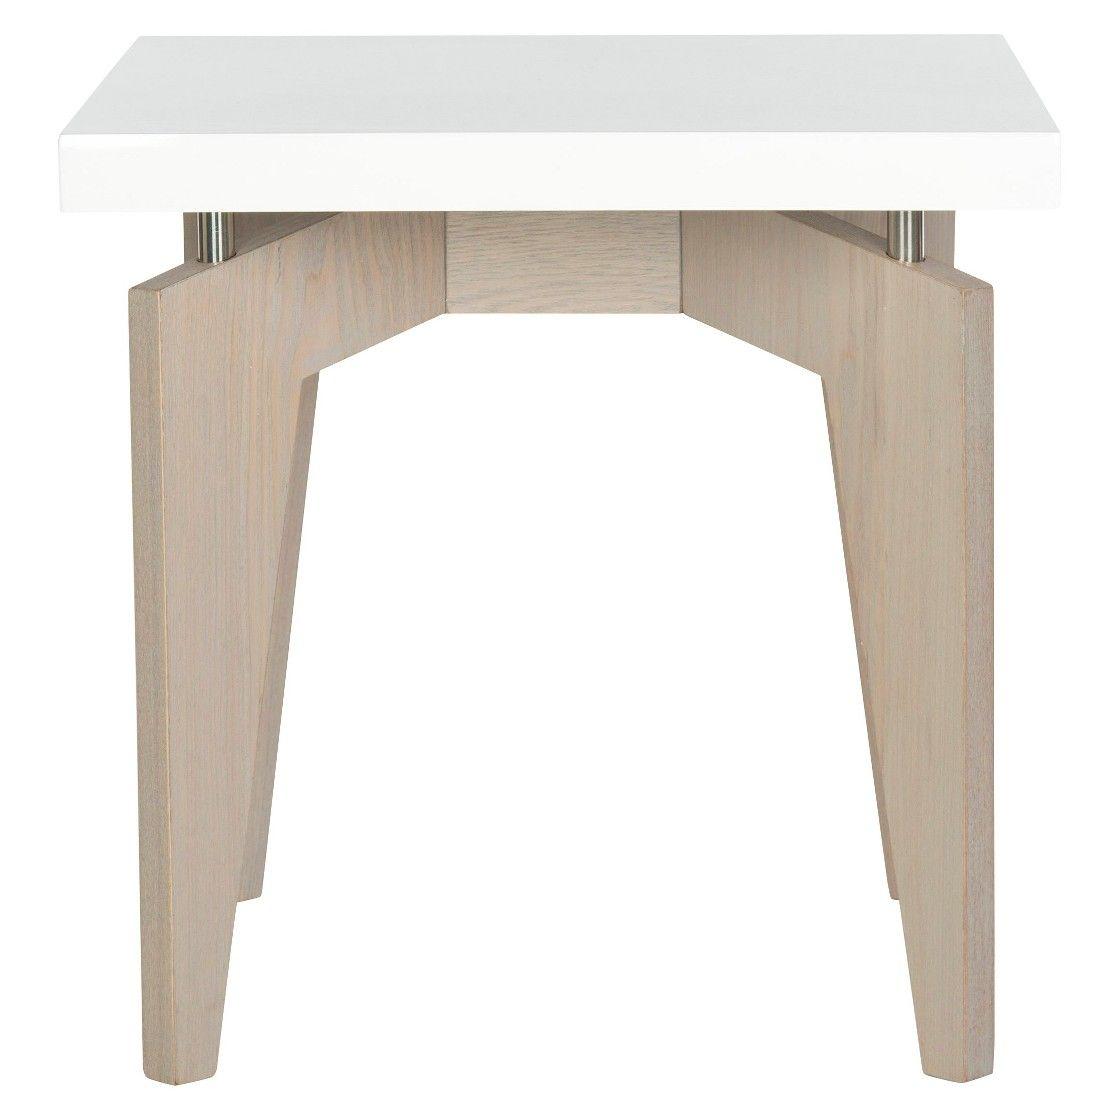 Safavieh Josef End Table